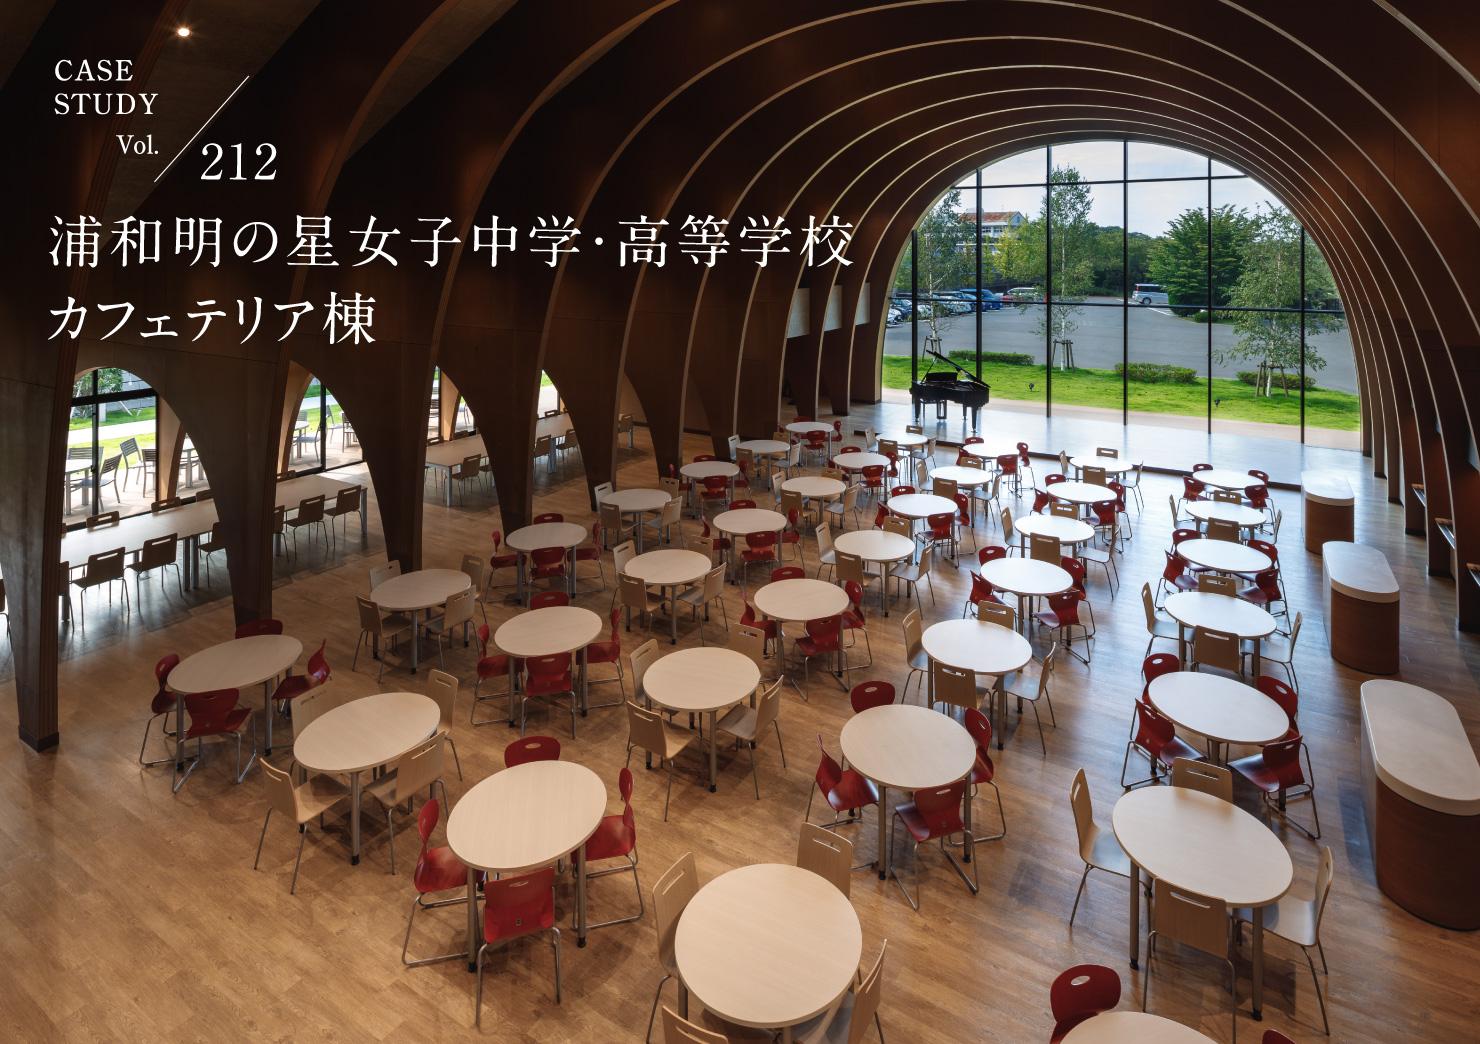 CASE STUDY Vol.212 浦和明の星女子中学・高等学校 カフェテリア棟